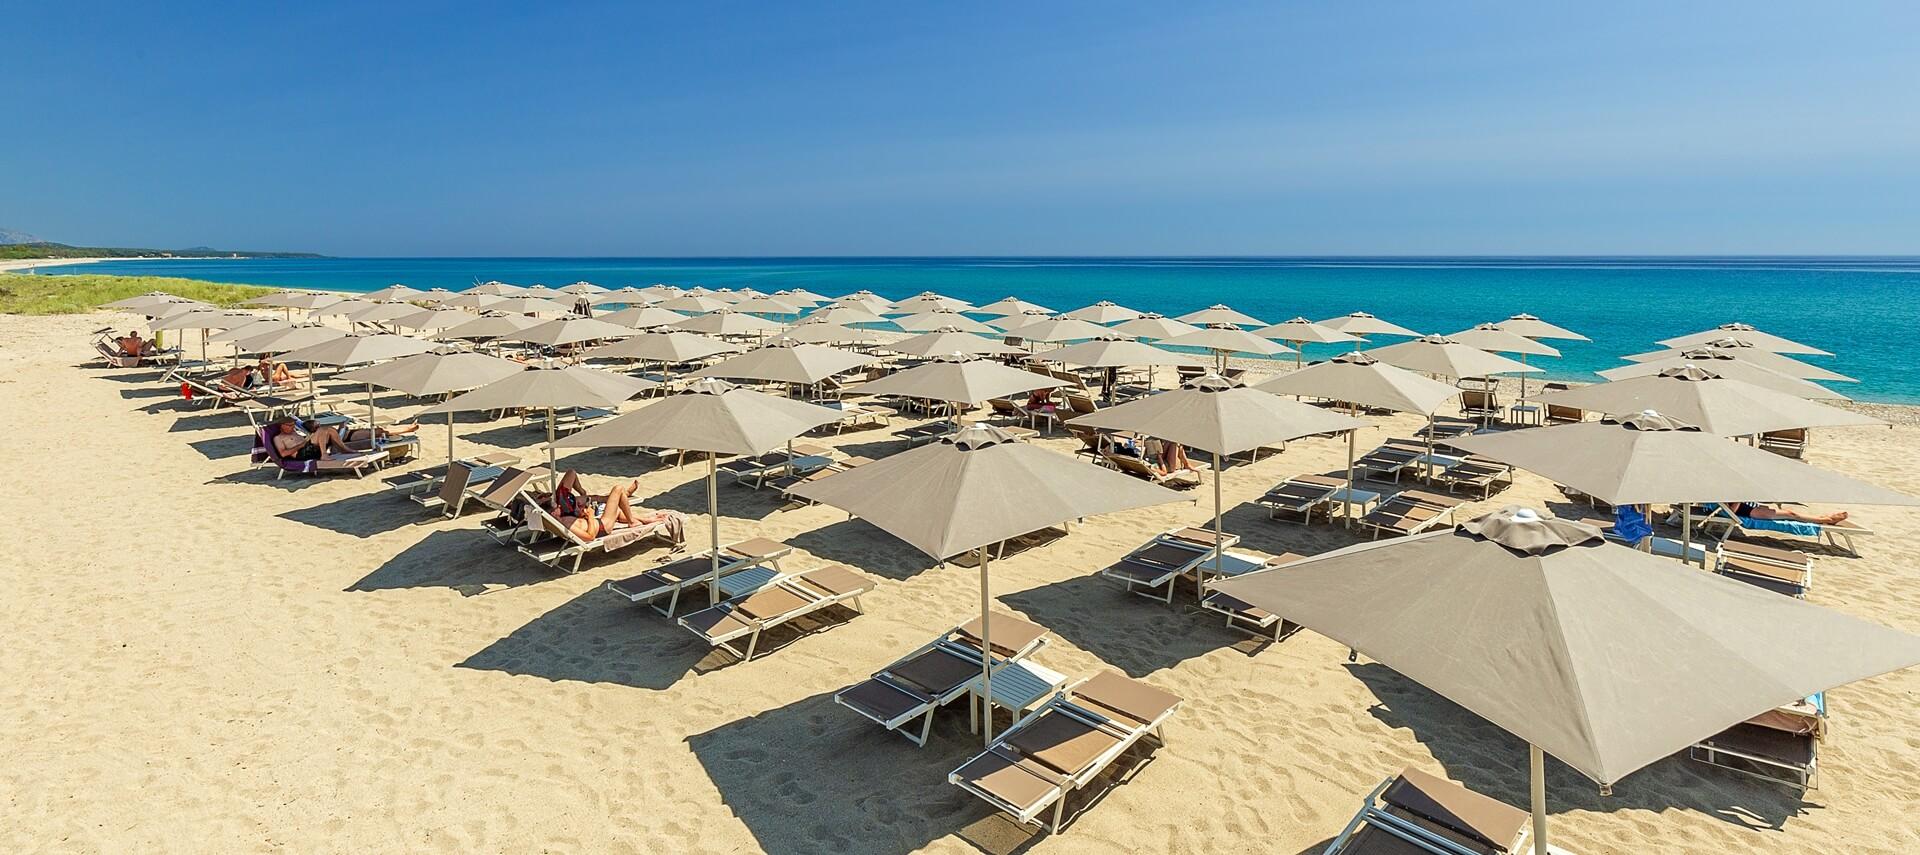 hotel_resort_sulla_spiaggia_cardedu_01